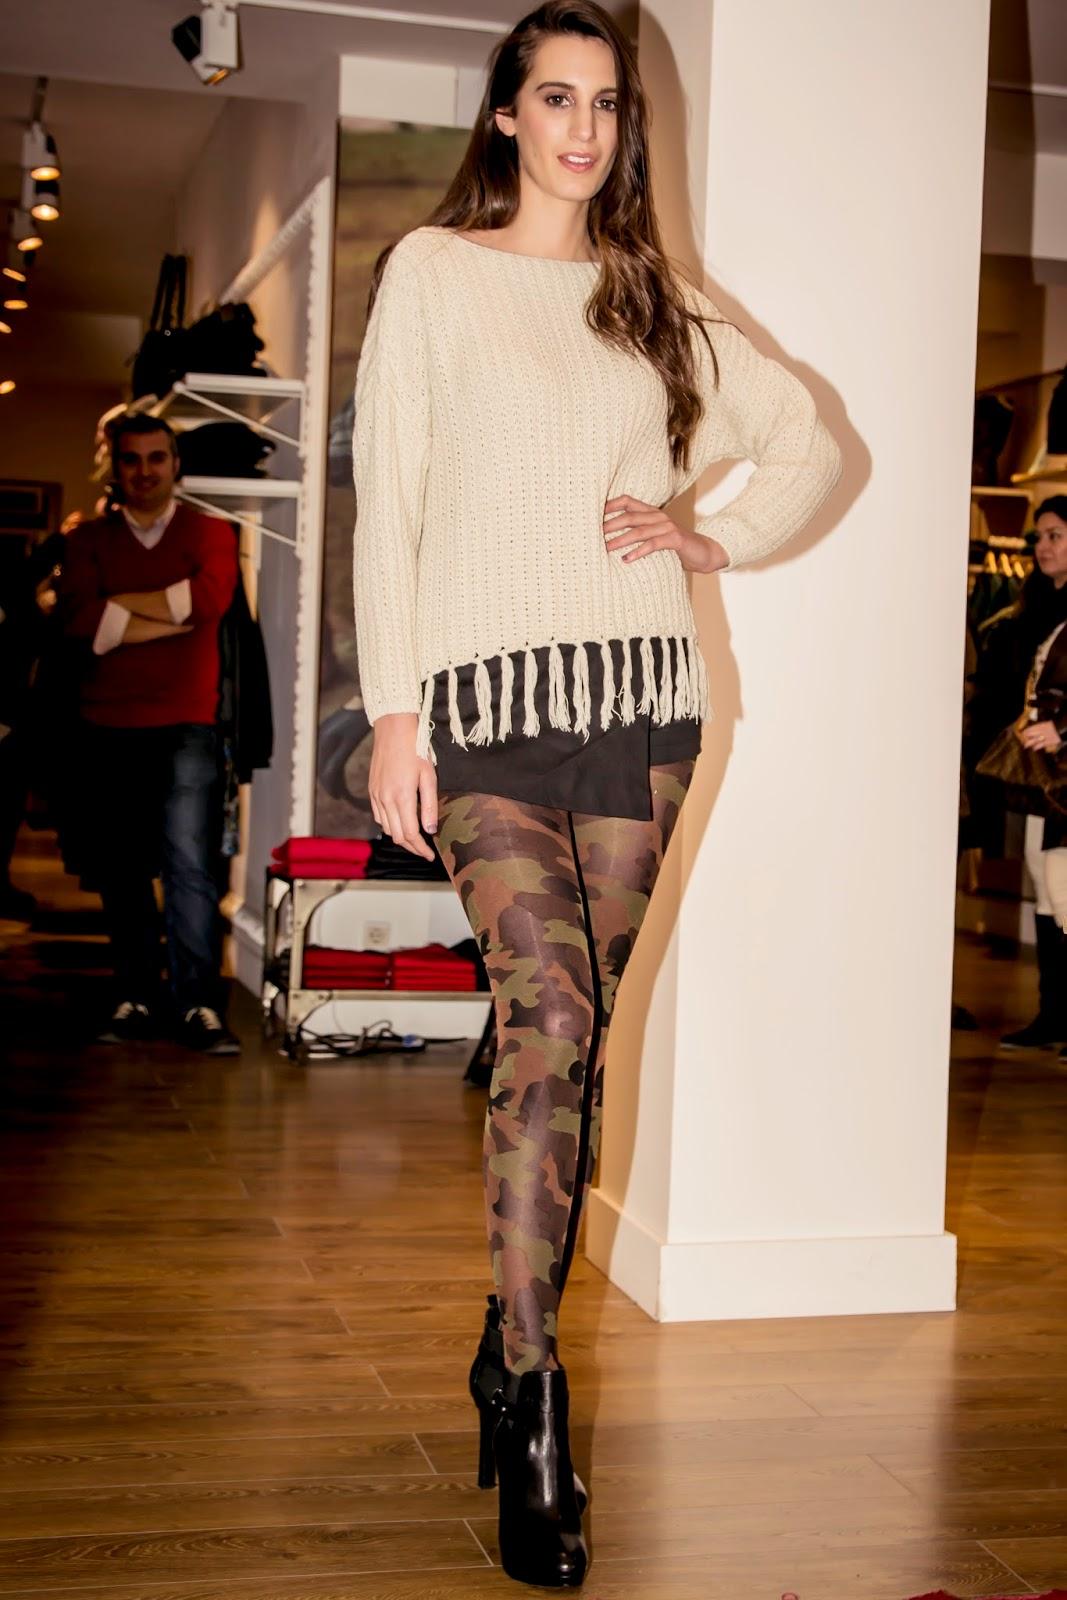 Cecilia de Rafael, Dandara, Moda, desfile, medias, lycra, fashion, style, Looks